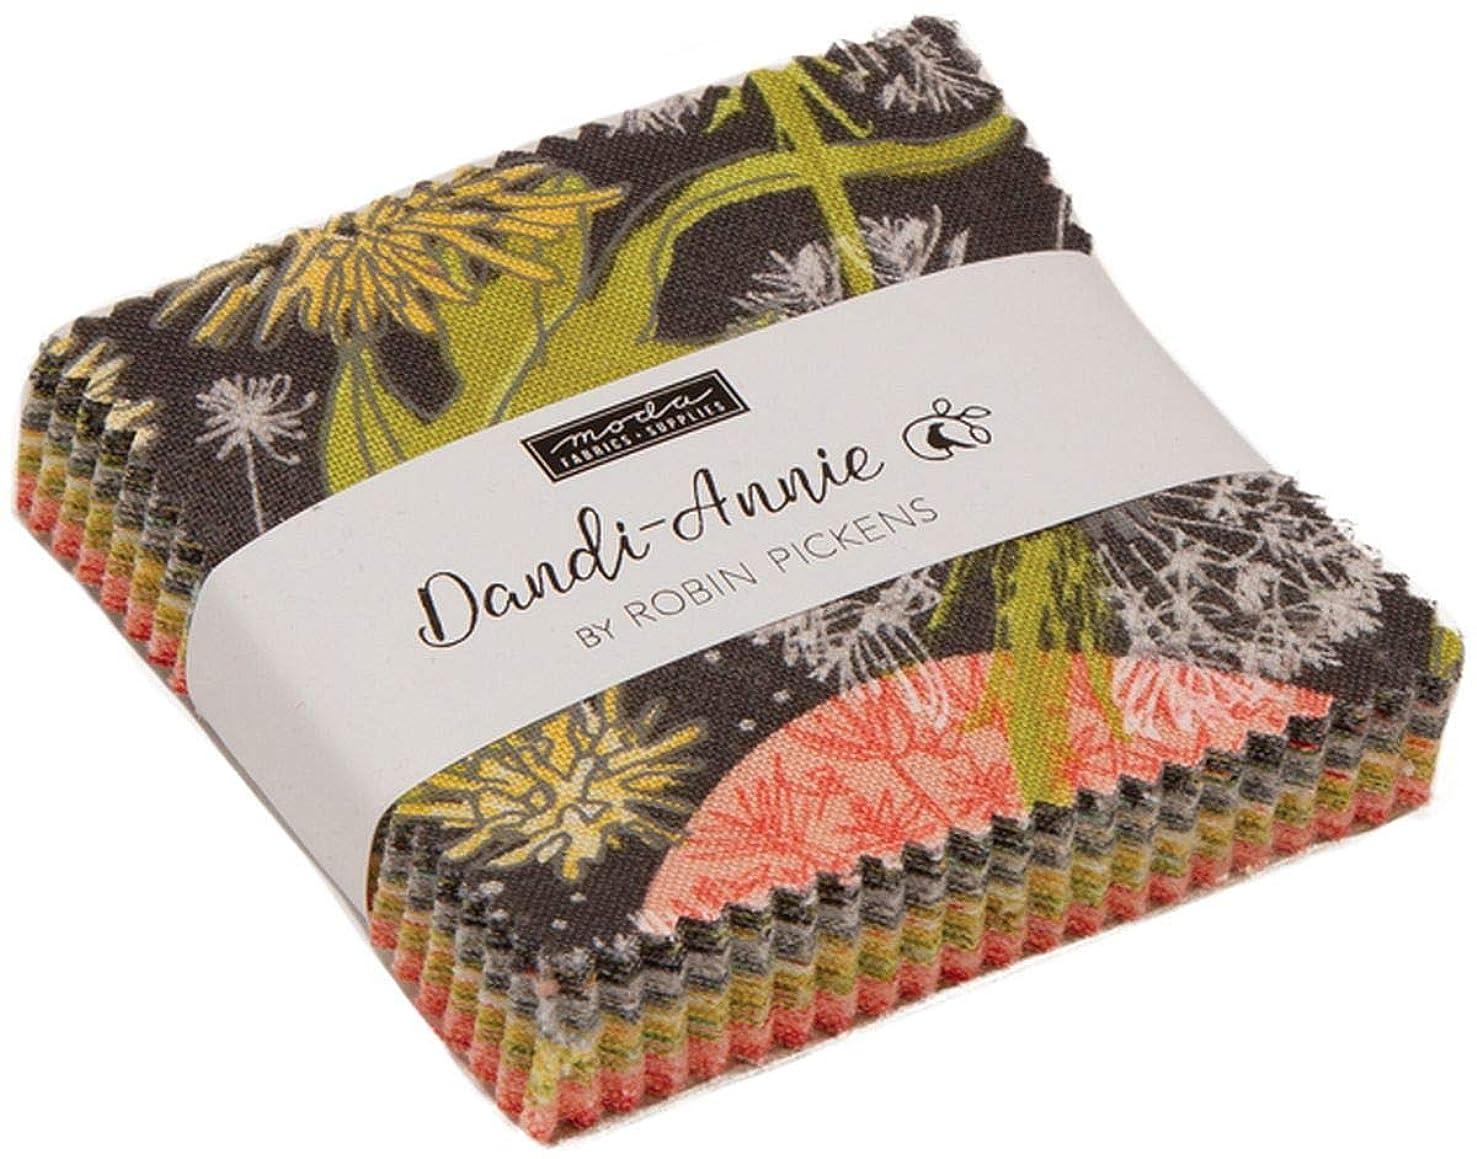 Dandi-Annie Mini Charm Pack by Robin Pickens; 42-2.5 Inch Precut Fabric Quilt Squares